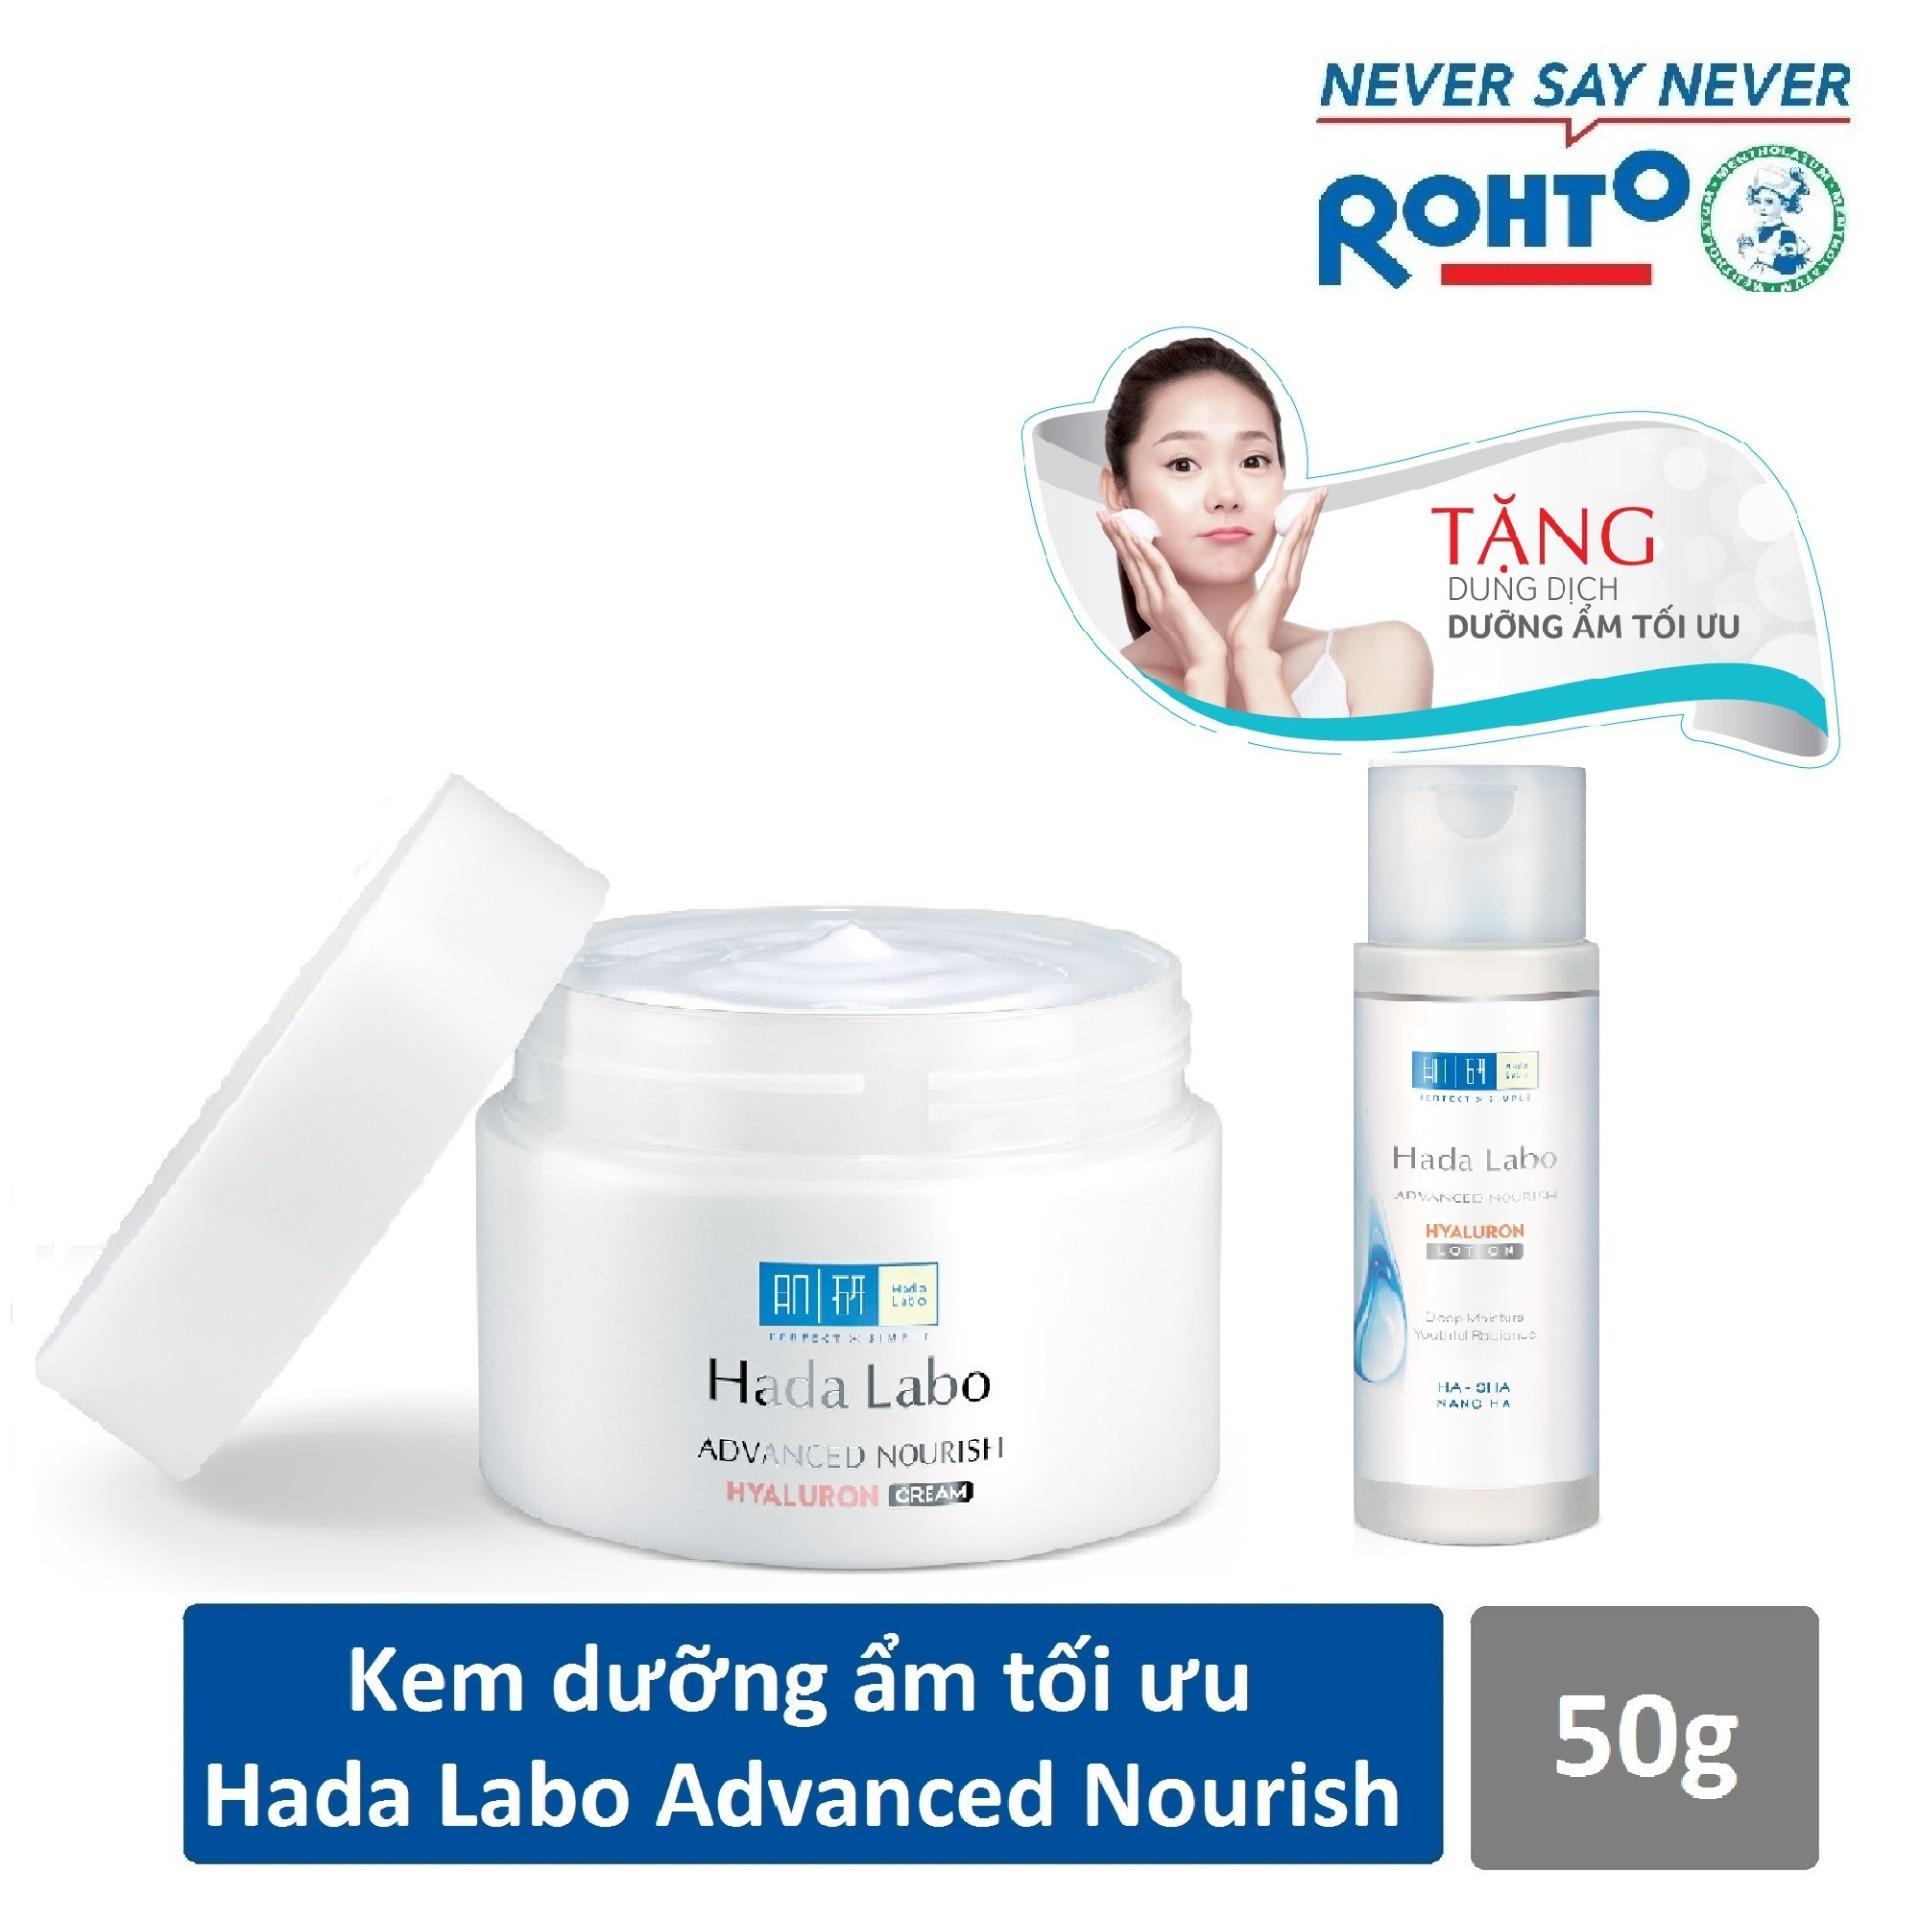 Kem dưỡng ẩm tối ưu Hada Labo Advanced Nourish Cream 50g + Tặng Dung dịch Hada Labo  40ml